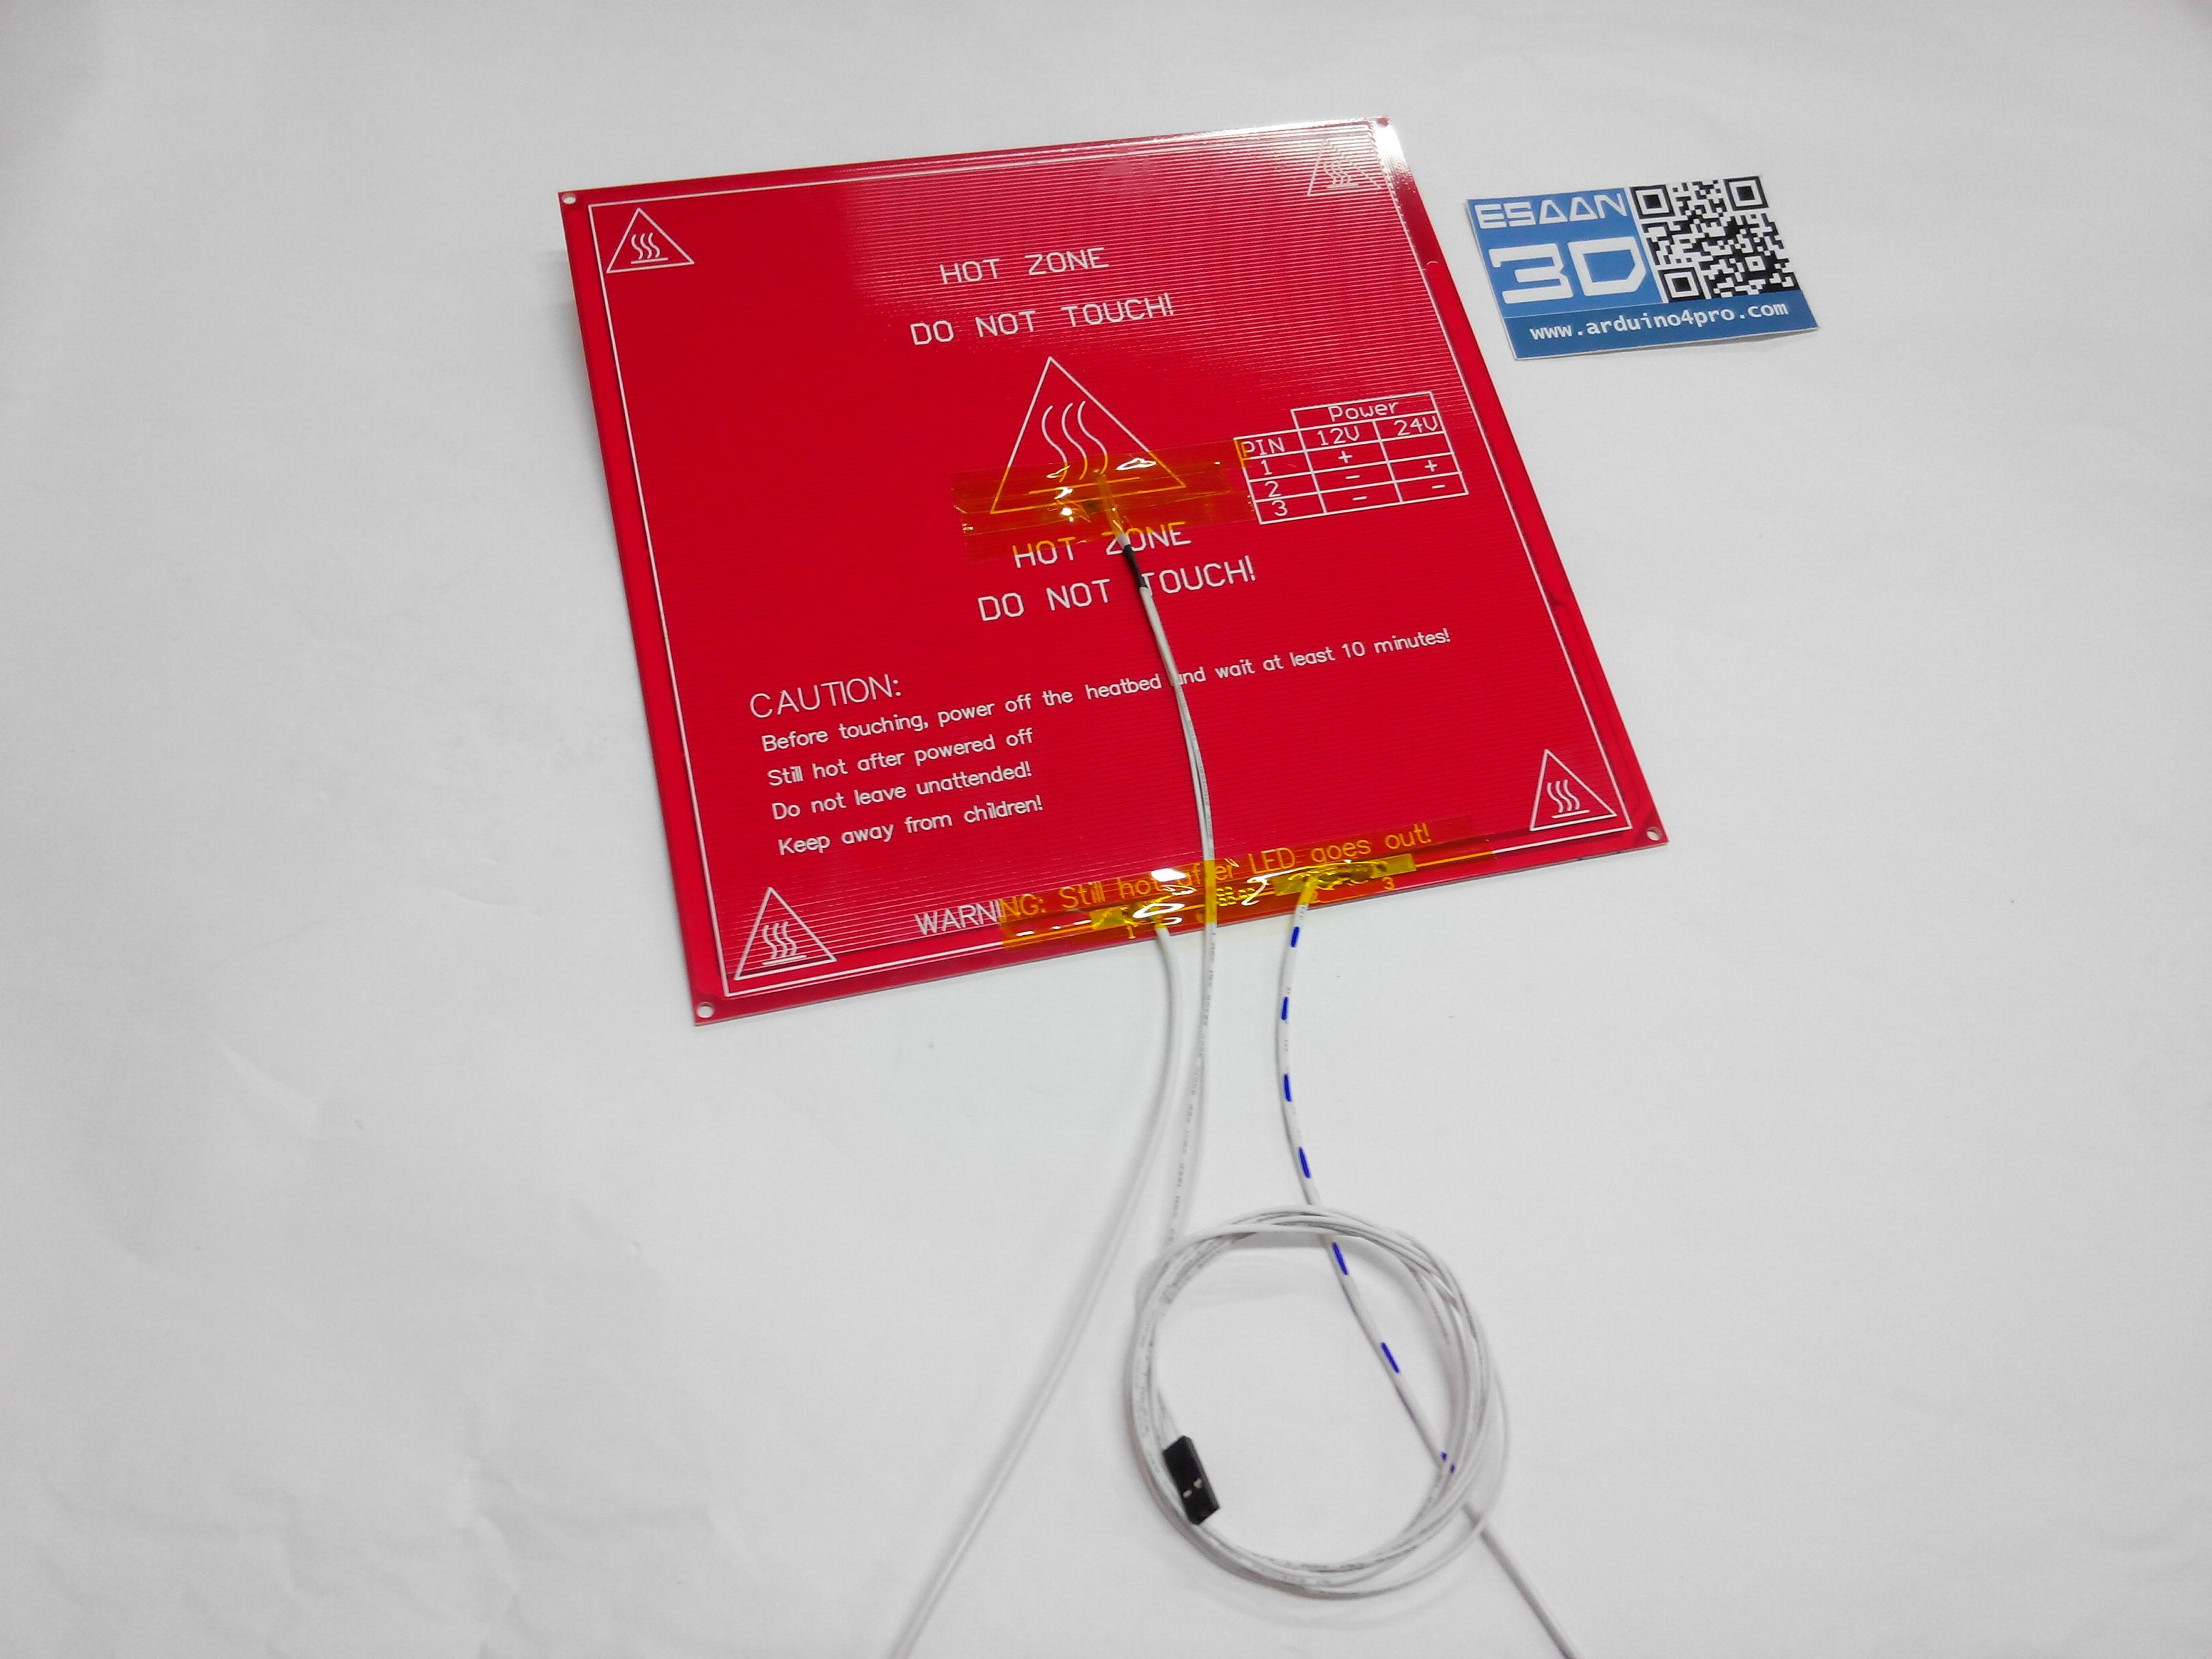 MK2B Dual Power PCB Heat Bed + 100K ohm NTC 3950 Thermistors + ชุดสายไฟยาว 50cm